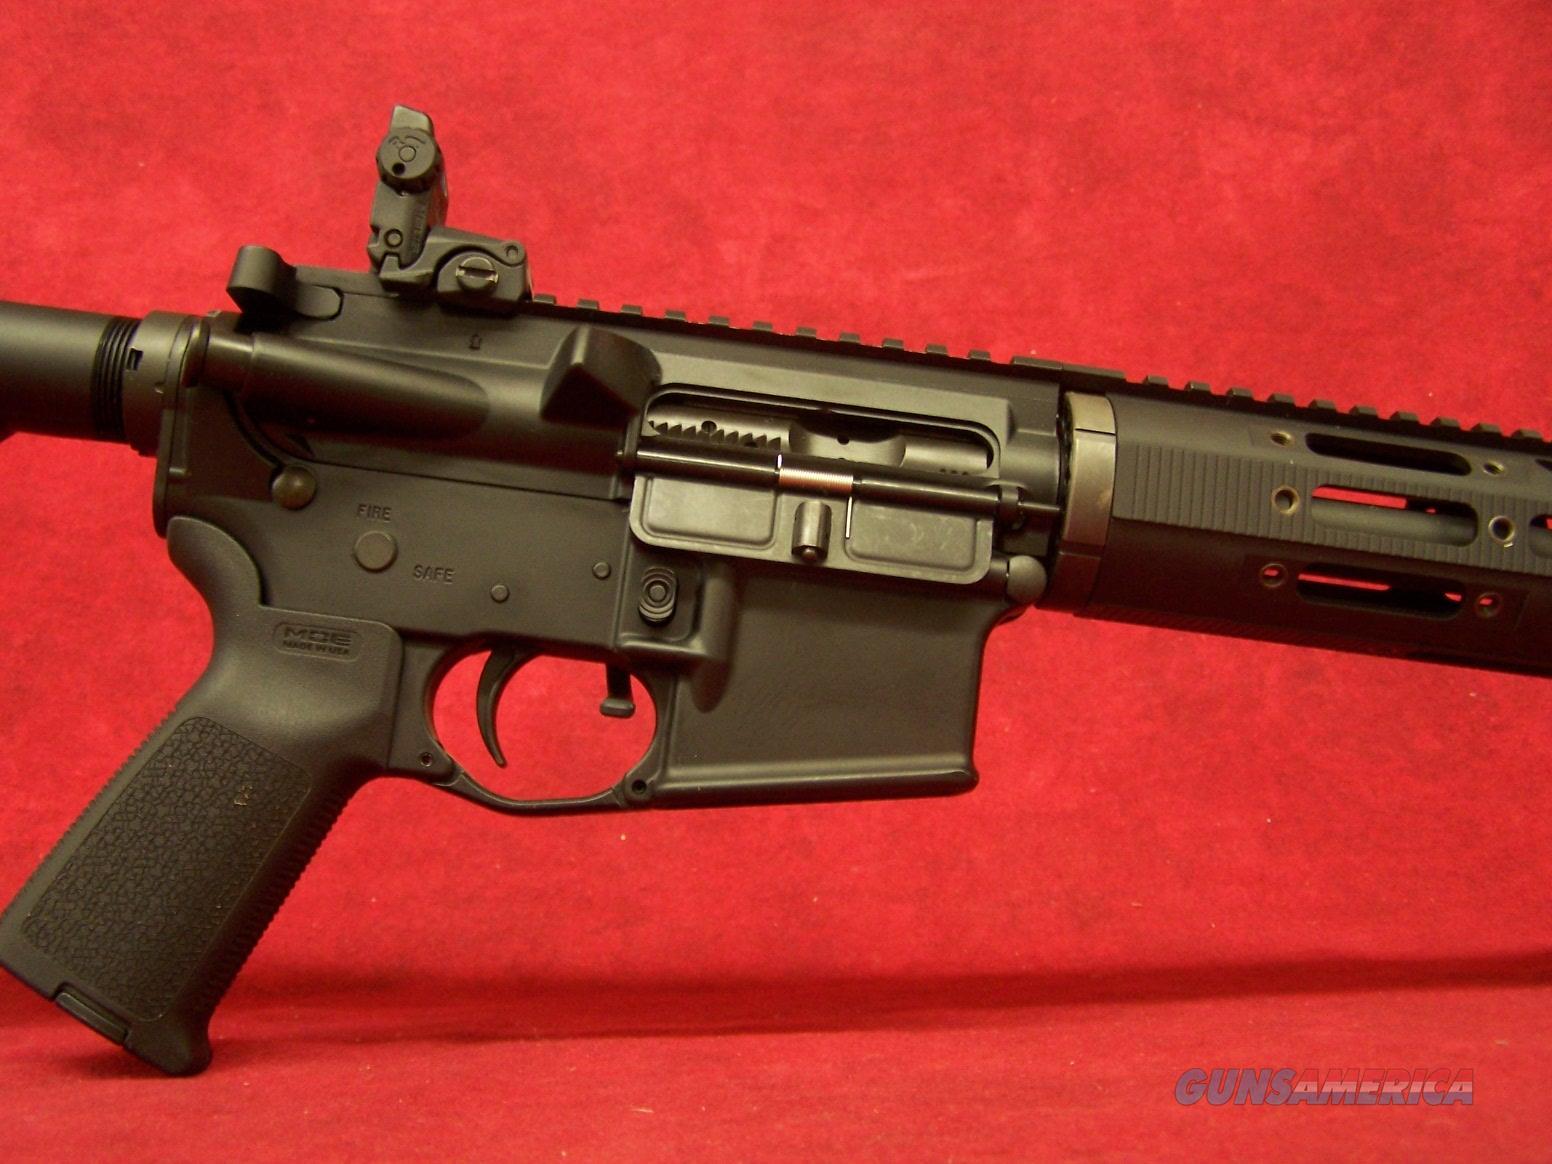 "DPMS A-15 TAC2 UPPER 16"" 223 Rem / 5.56mm   Guns > Rifles > DPMS - Panther Arms > Complete Rifle"